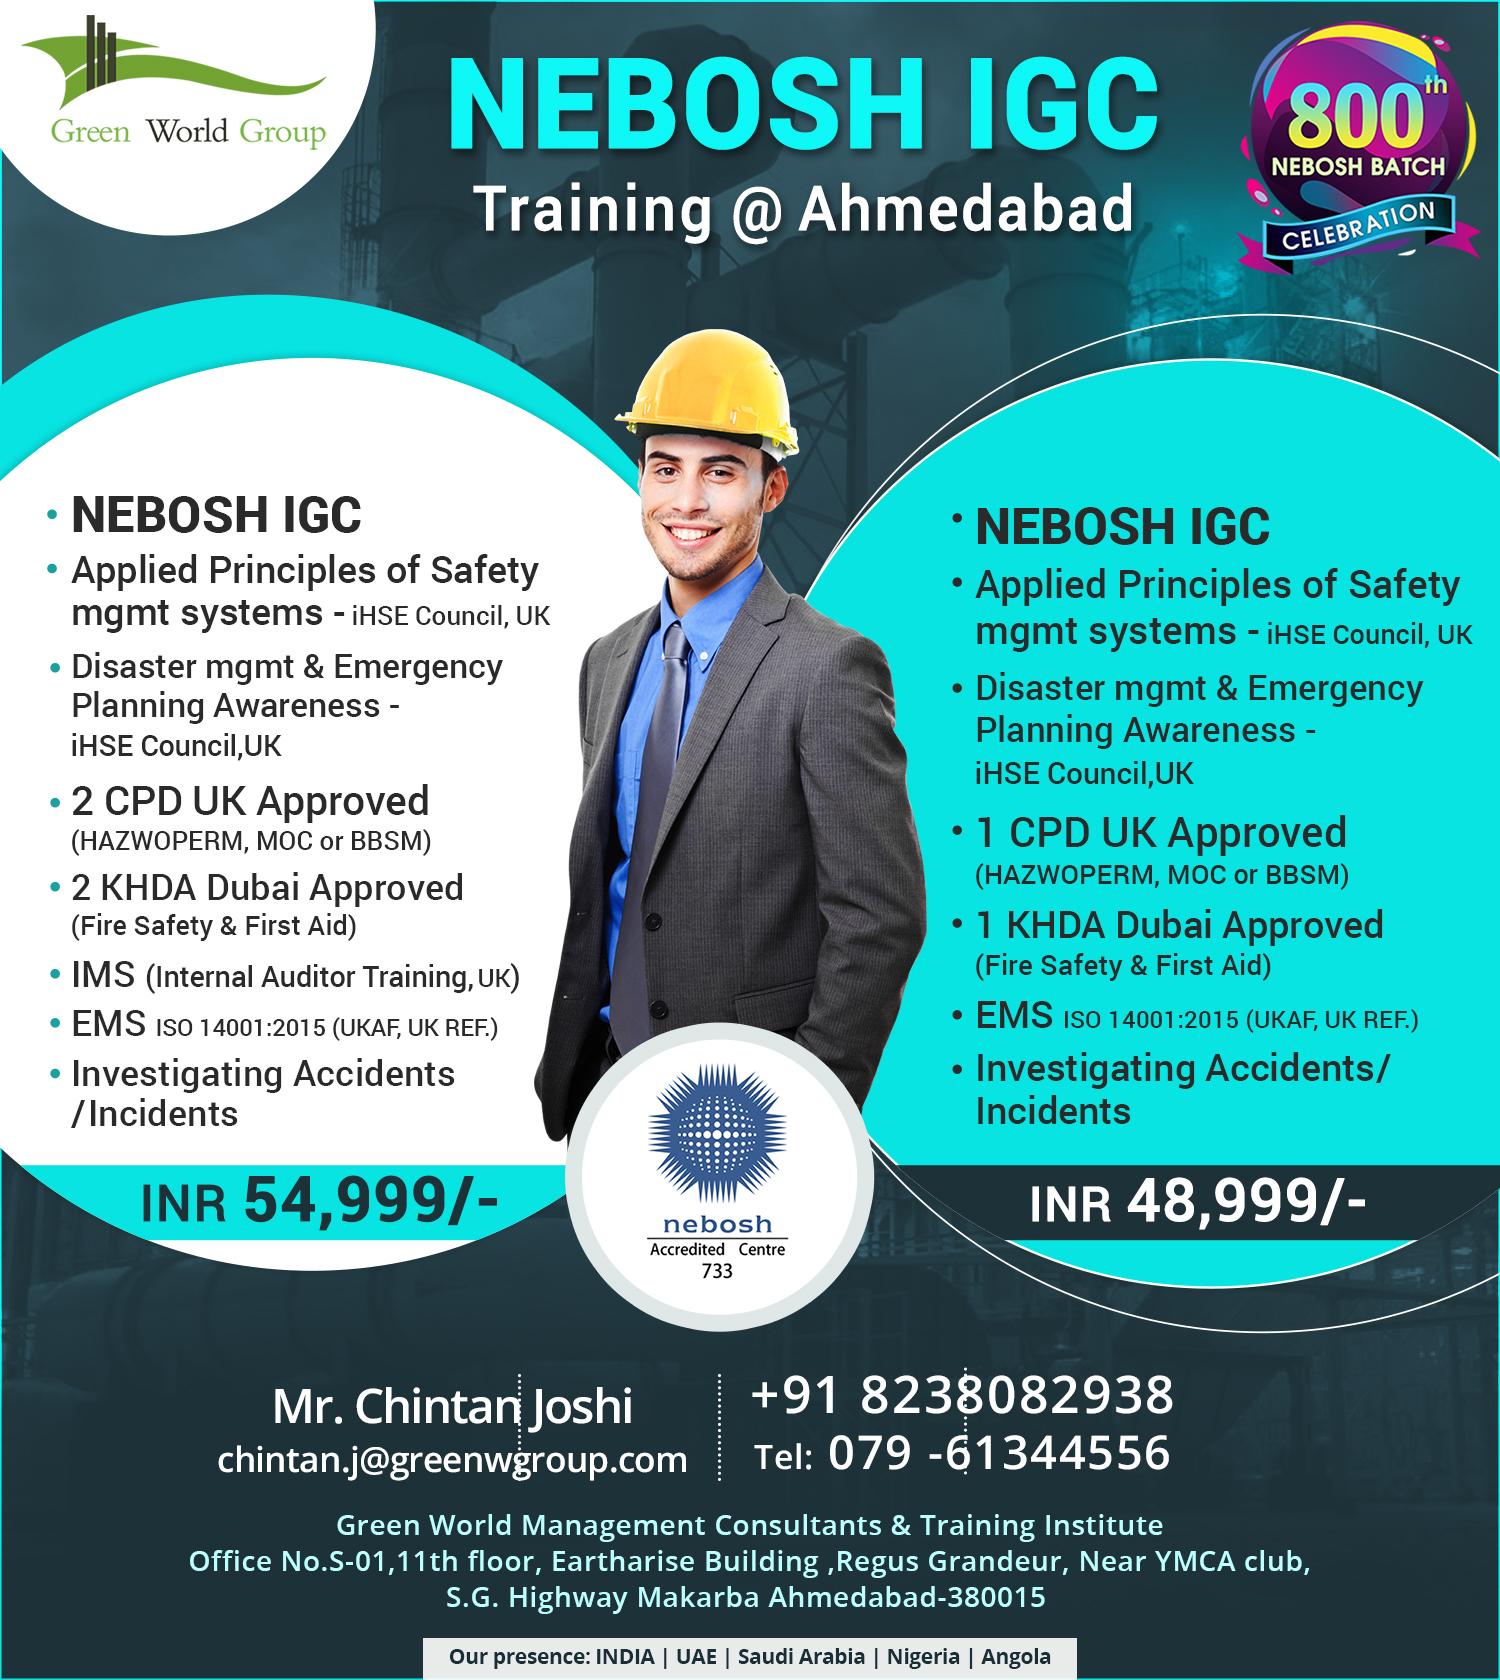 NEBOSH-IGC_December-Offer_2018_Cochin